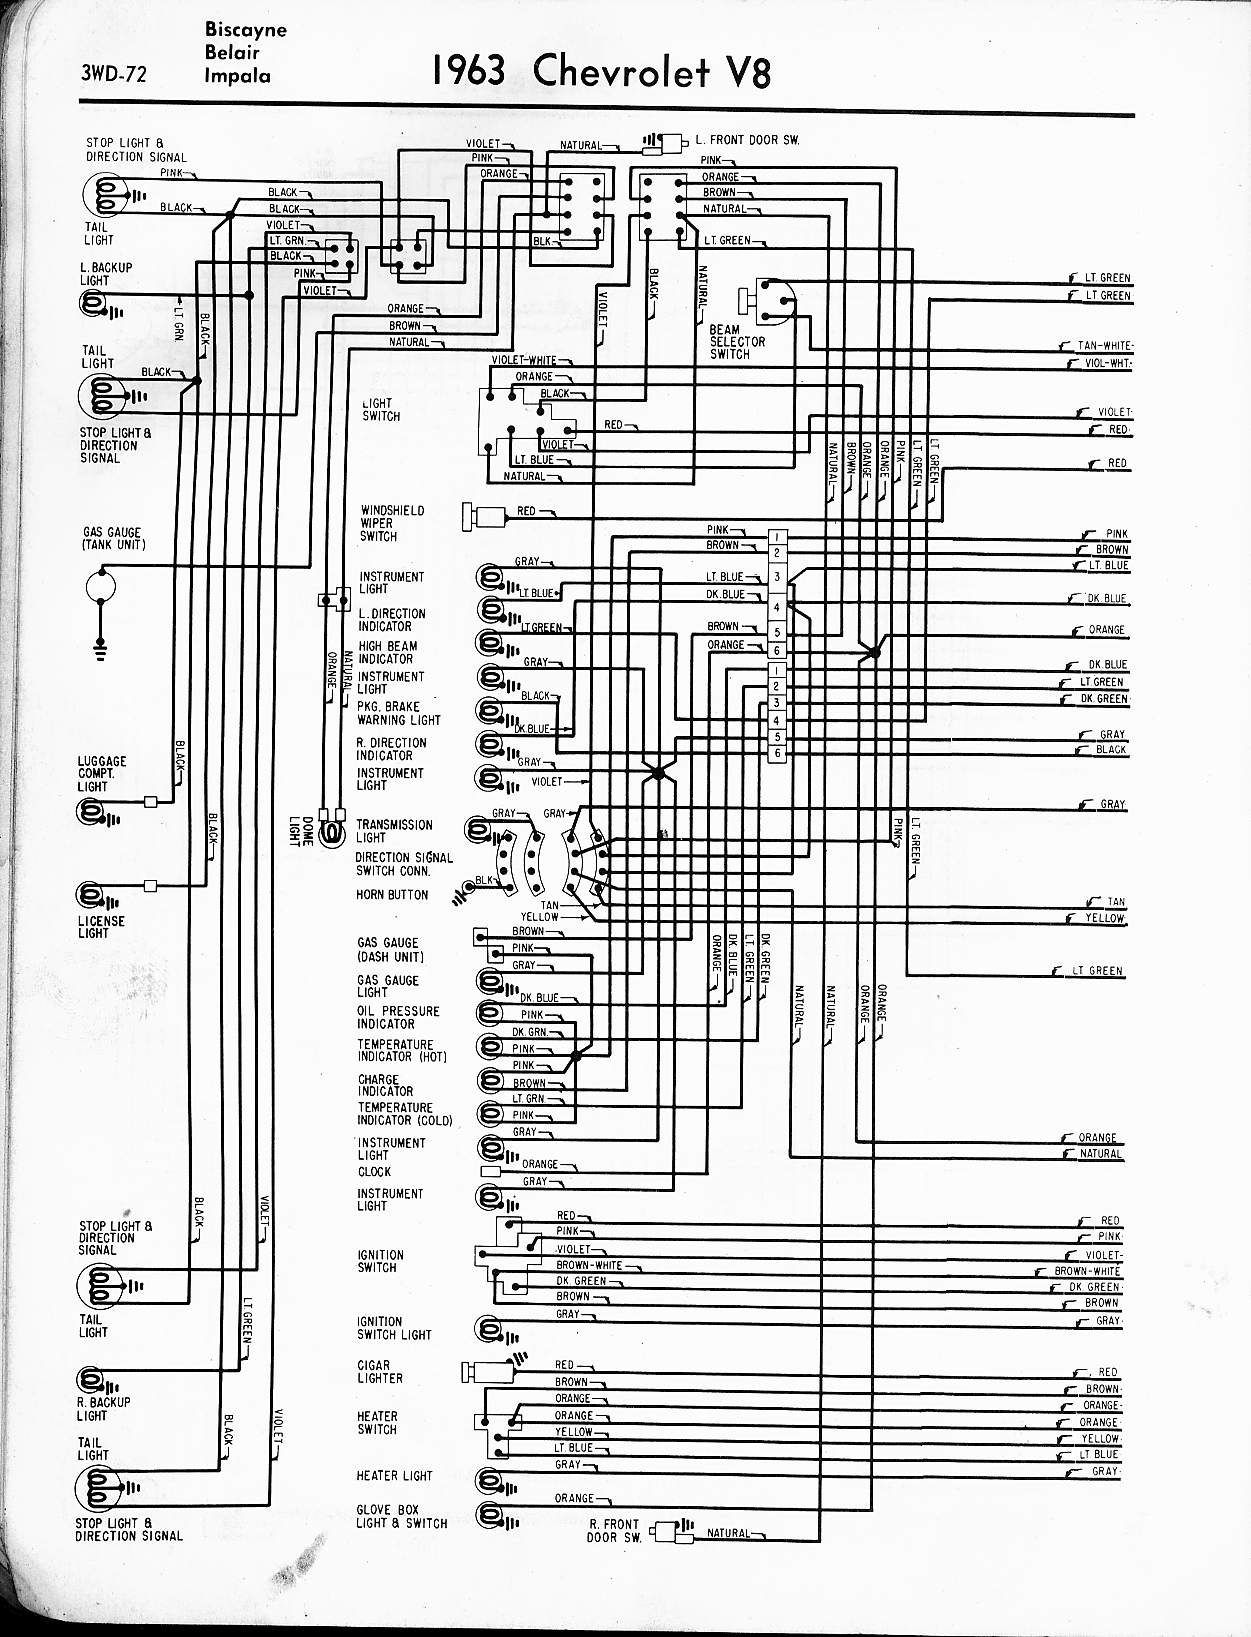 2006 chevy impala wiring diagram